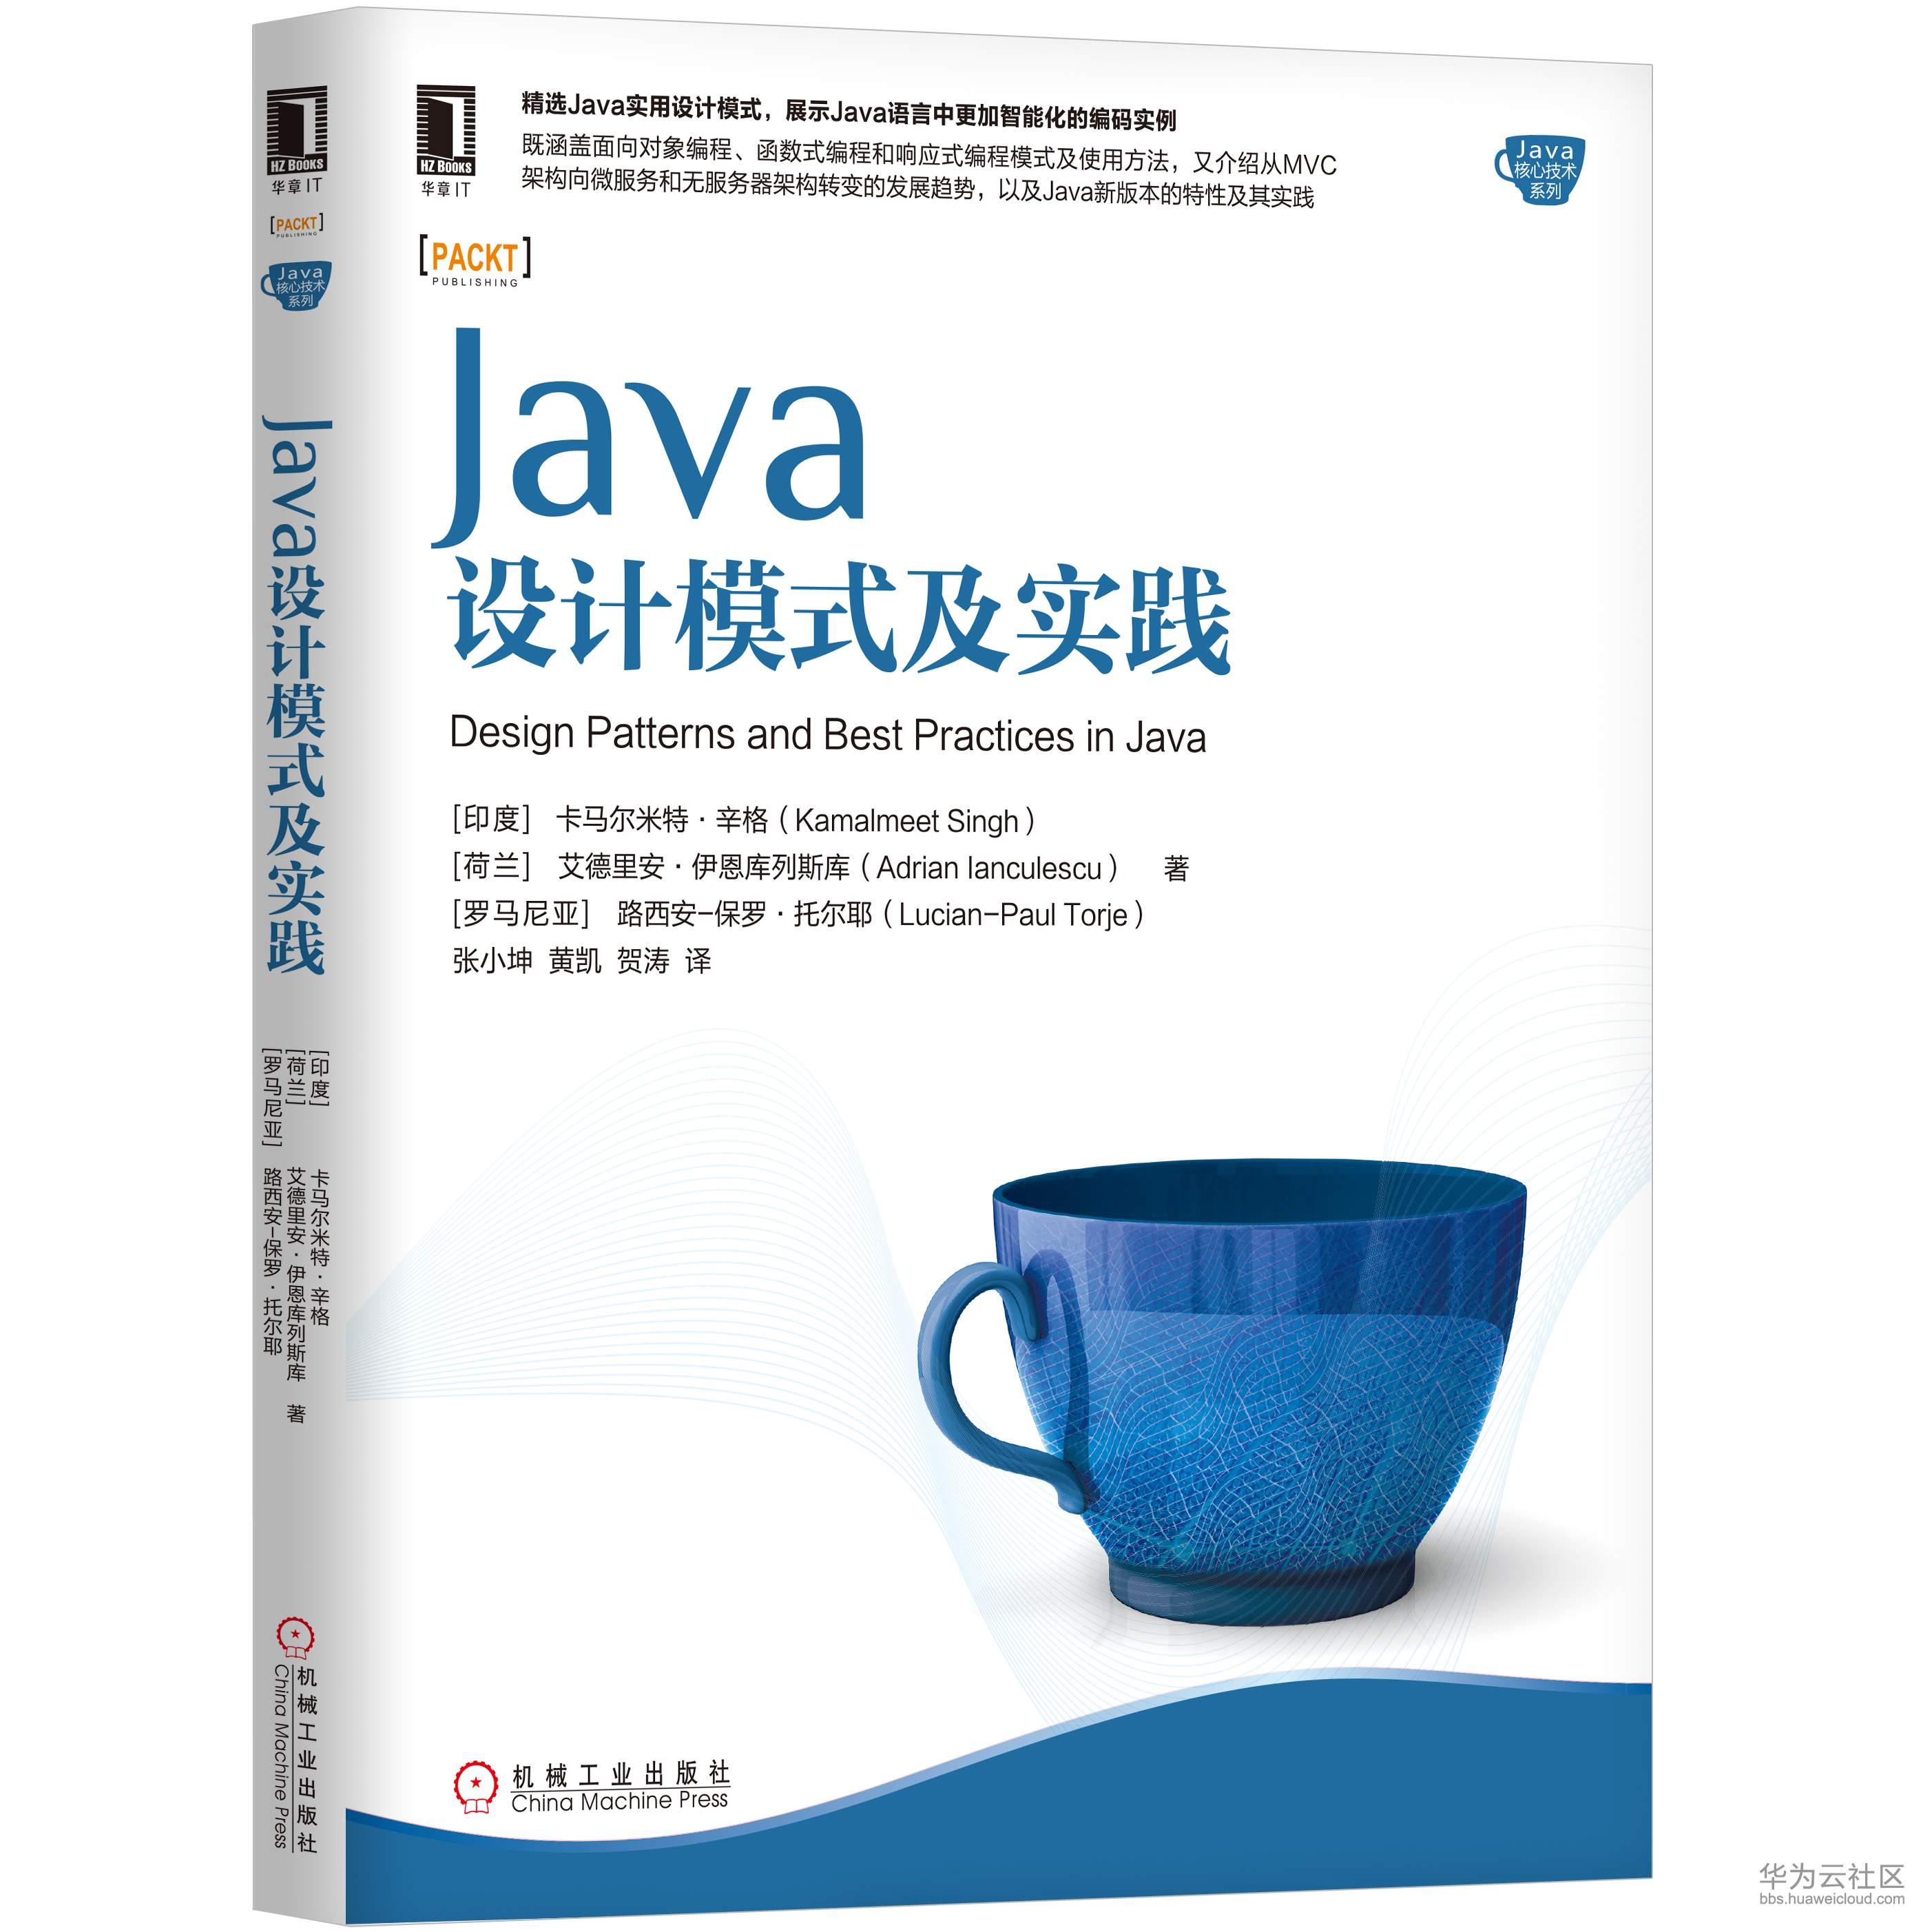 Java设计模式及实践 立.jpg